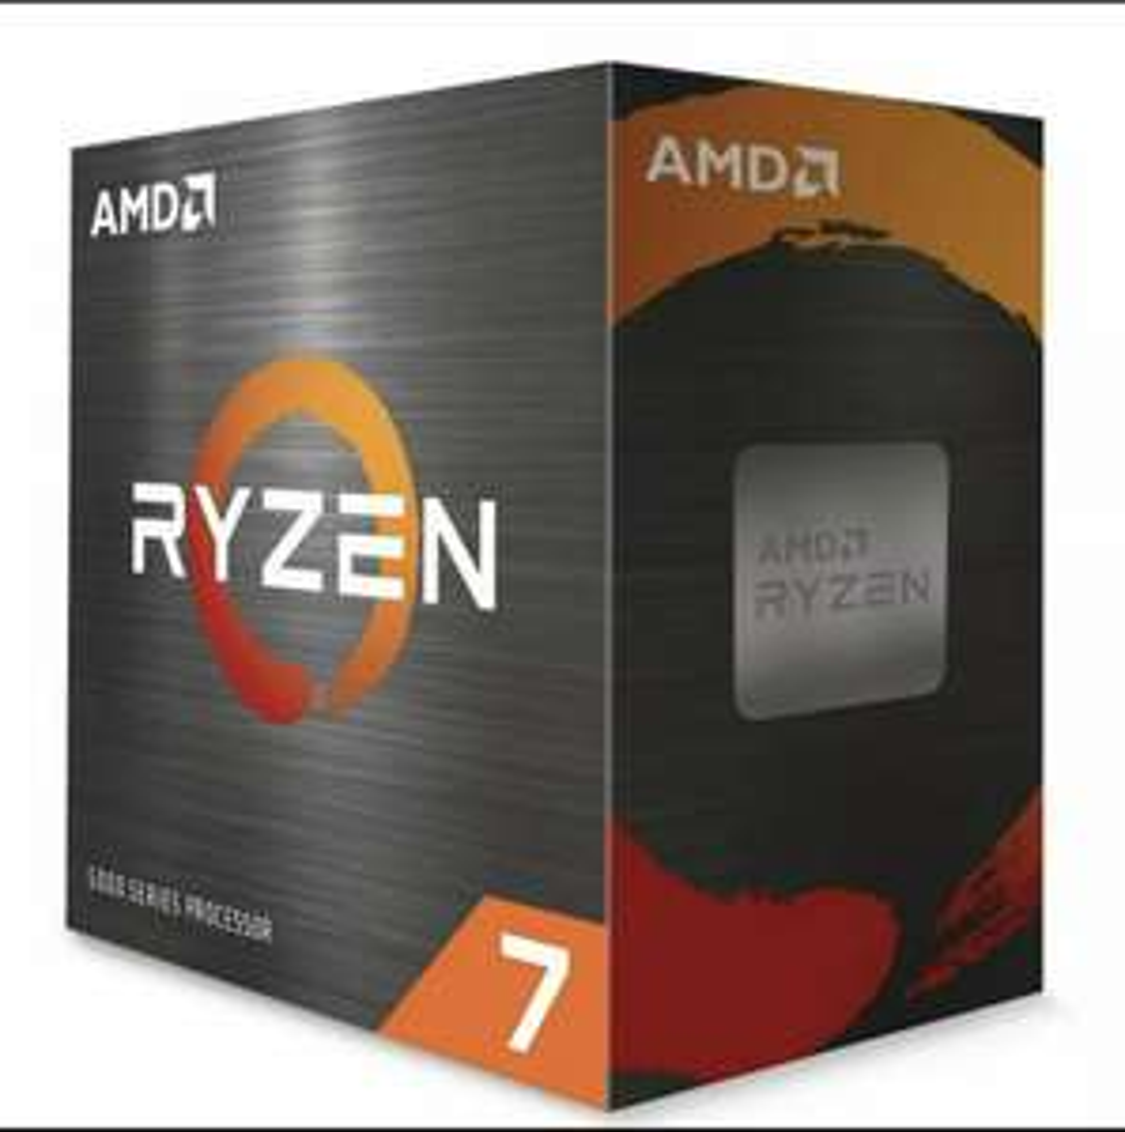 AMD Ryzen 7 5800X Boxed Prozessor, 8C/16T 3,8GHz-4,7GHz (Ausstellungsstück)